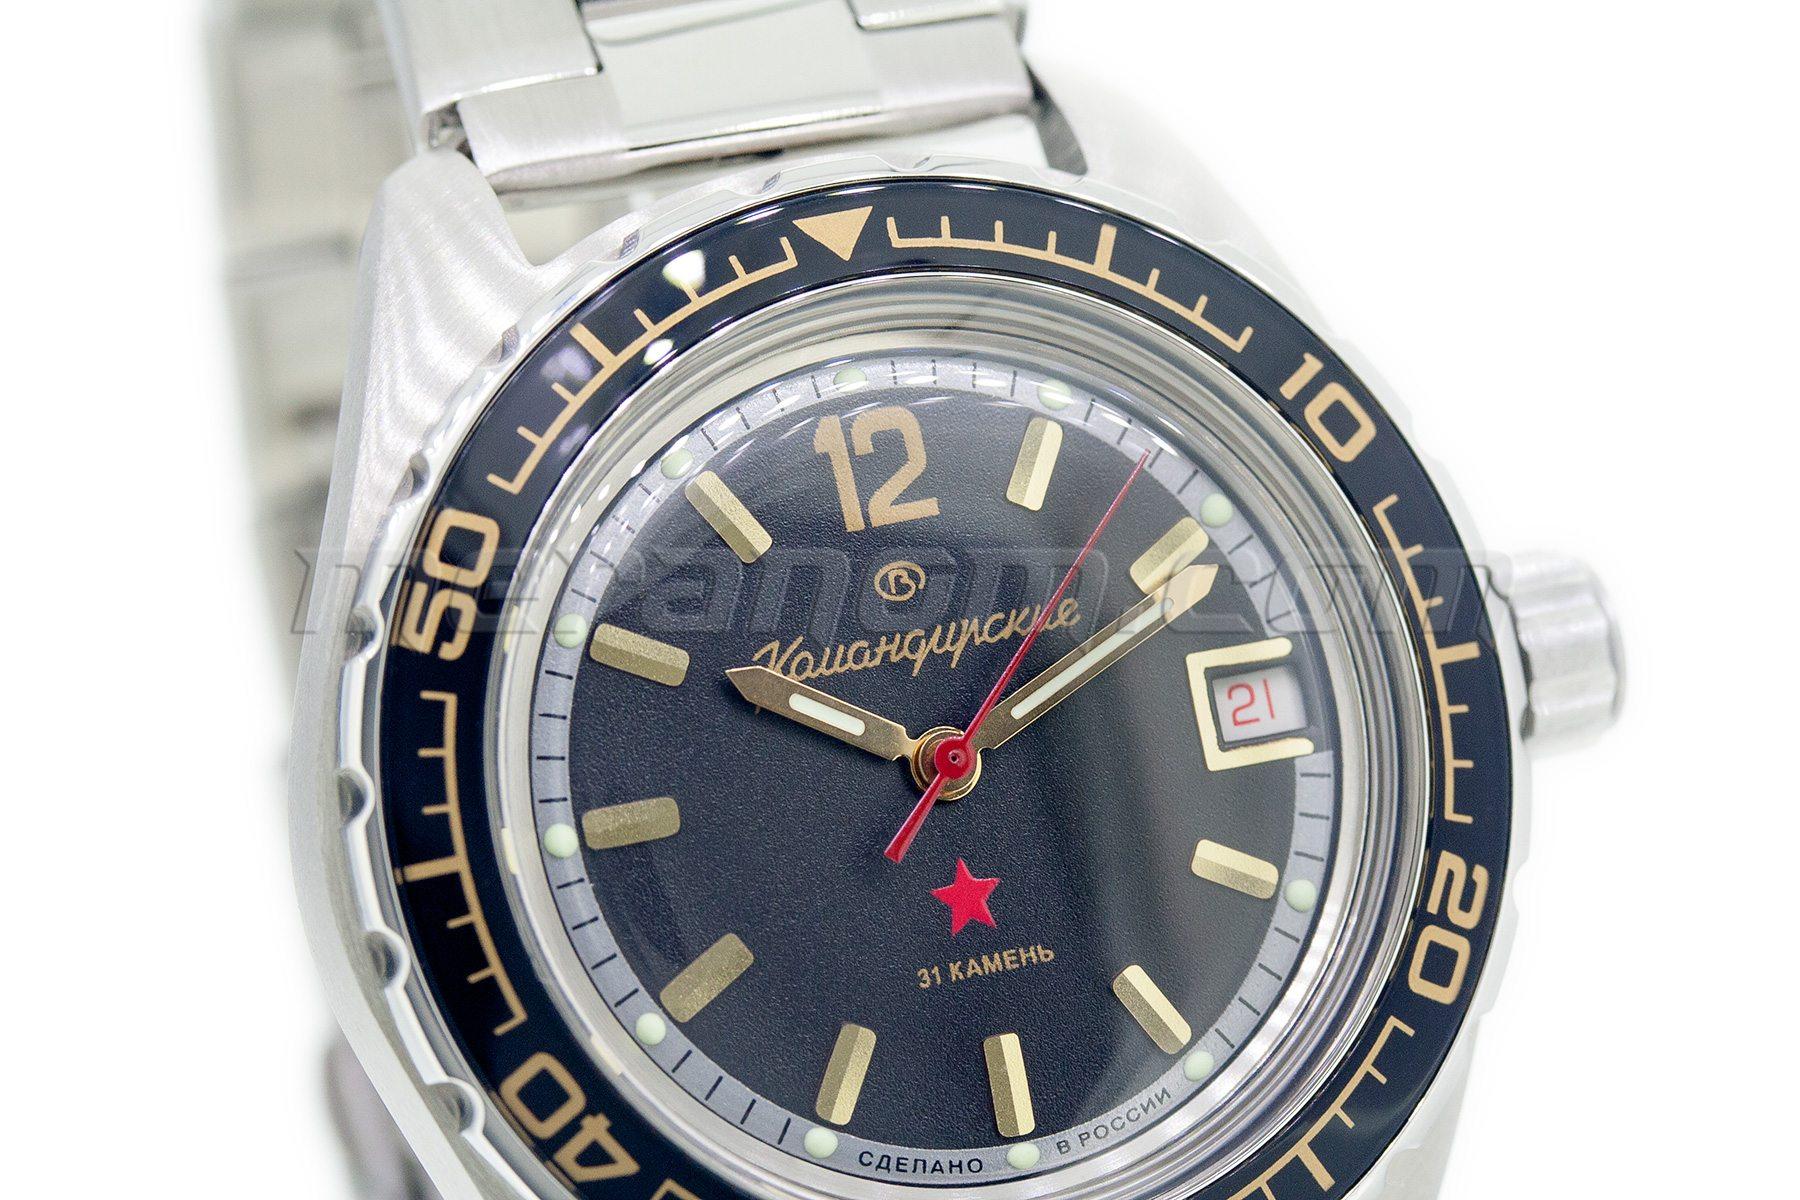 Vostok watch komandirskie 020741 buy from an authorized dealer for Komandirskie watches